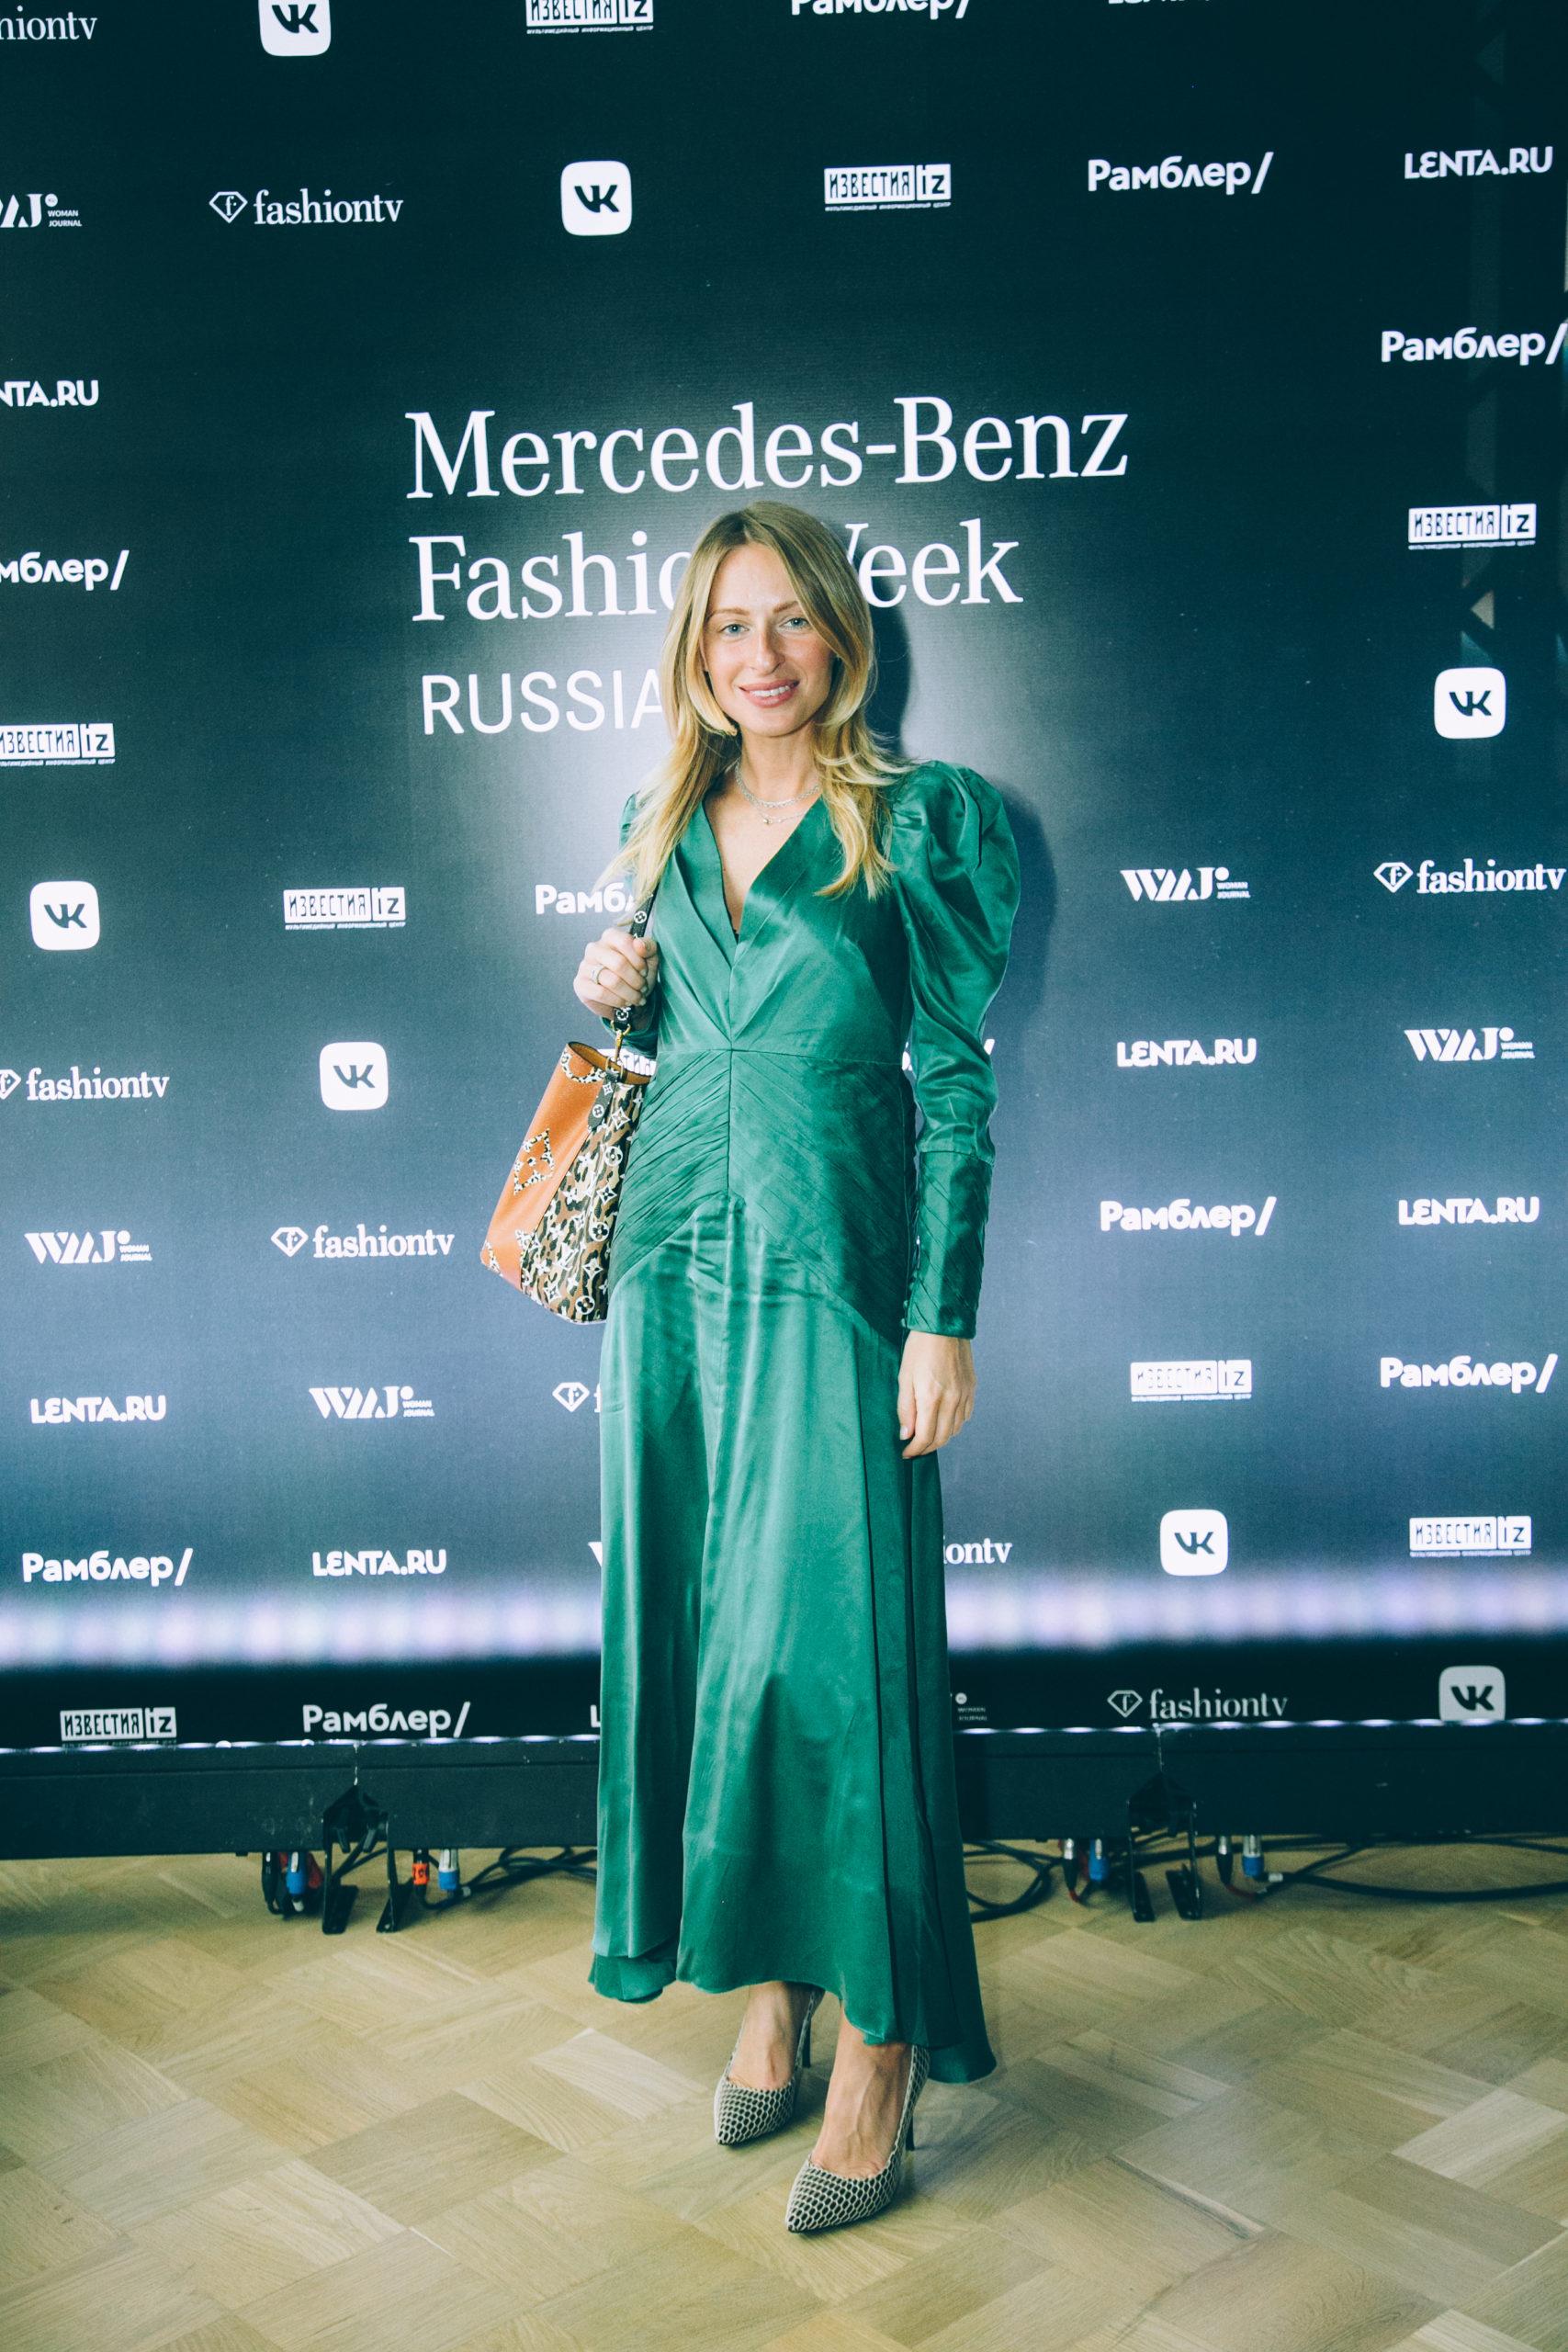 Ирина Чайковская, Александр Гудков и другие на закрытии Недели моды Mercedes-Benz Week Russia